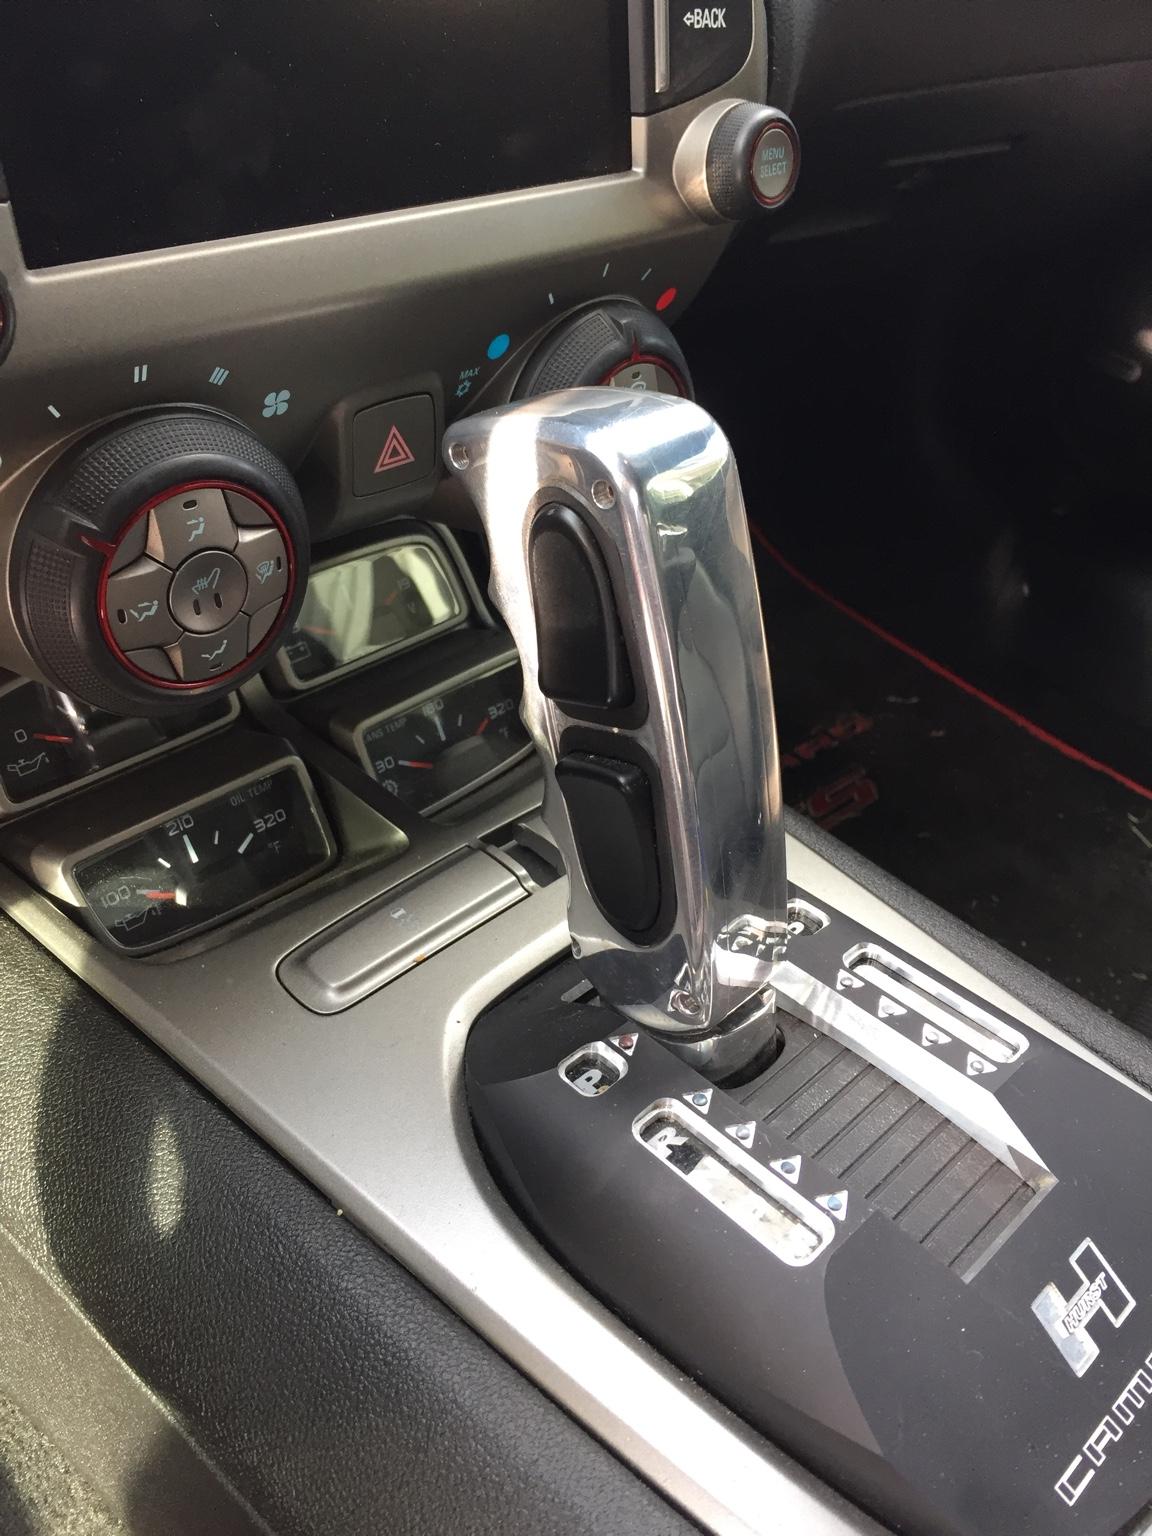 Camaro chevy camaro ss automatic : WTB HURST SHIFTER FOR AUTOMATIC - Camaro5 Chevy Camaro Forum ...